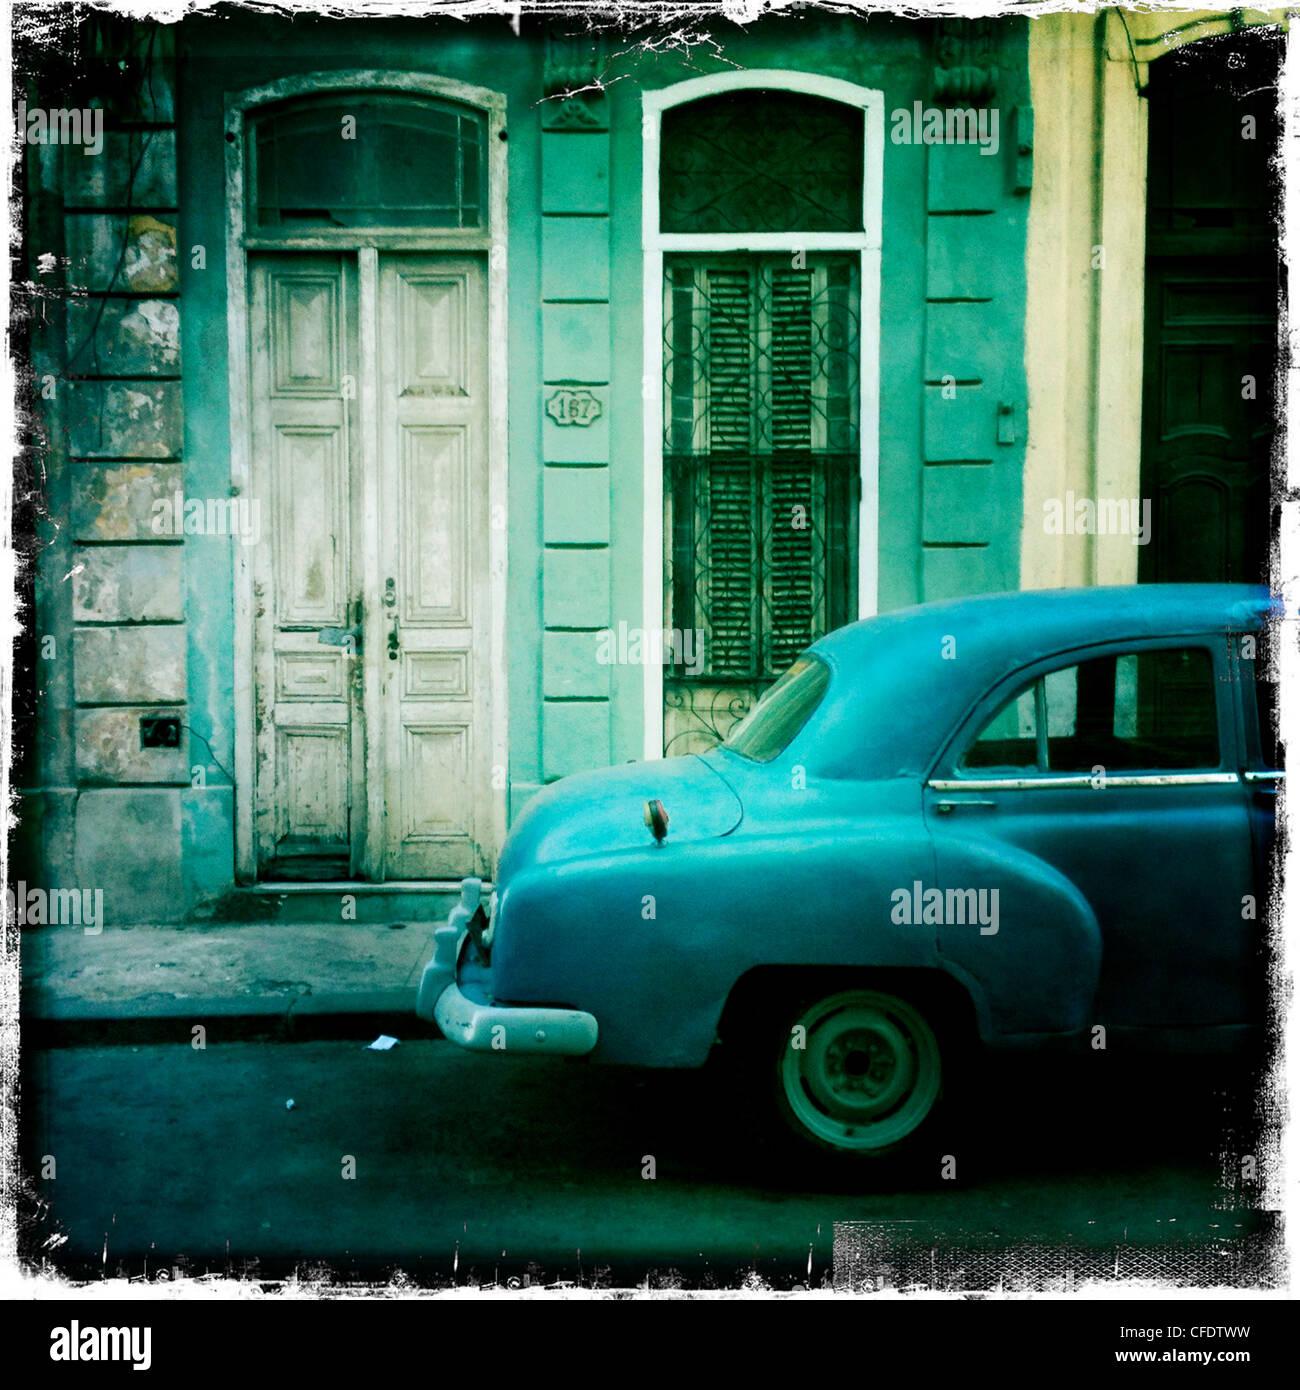 Amerikanische Oldtimer, Havanna, Kuba, Westindische Inseln, Karibik, Mittelamerika Stockbild